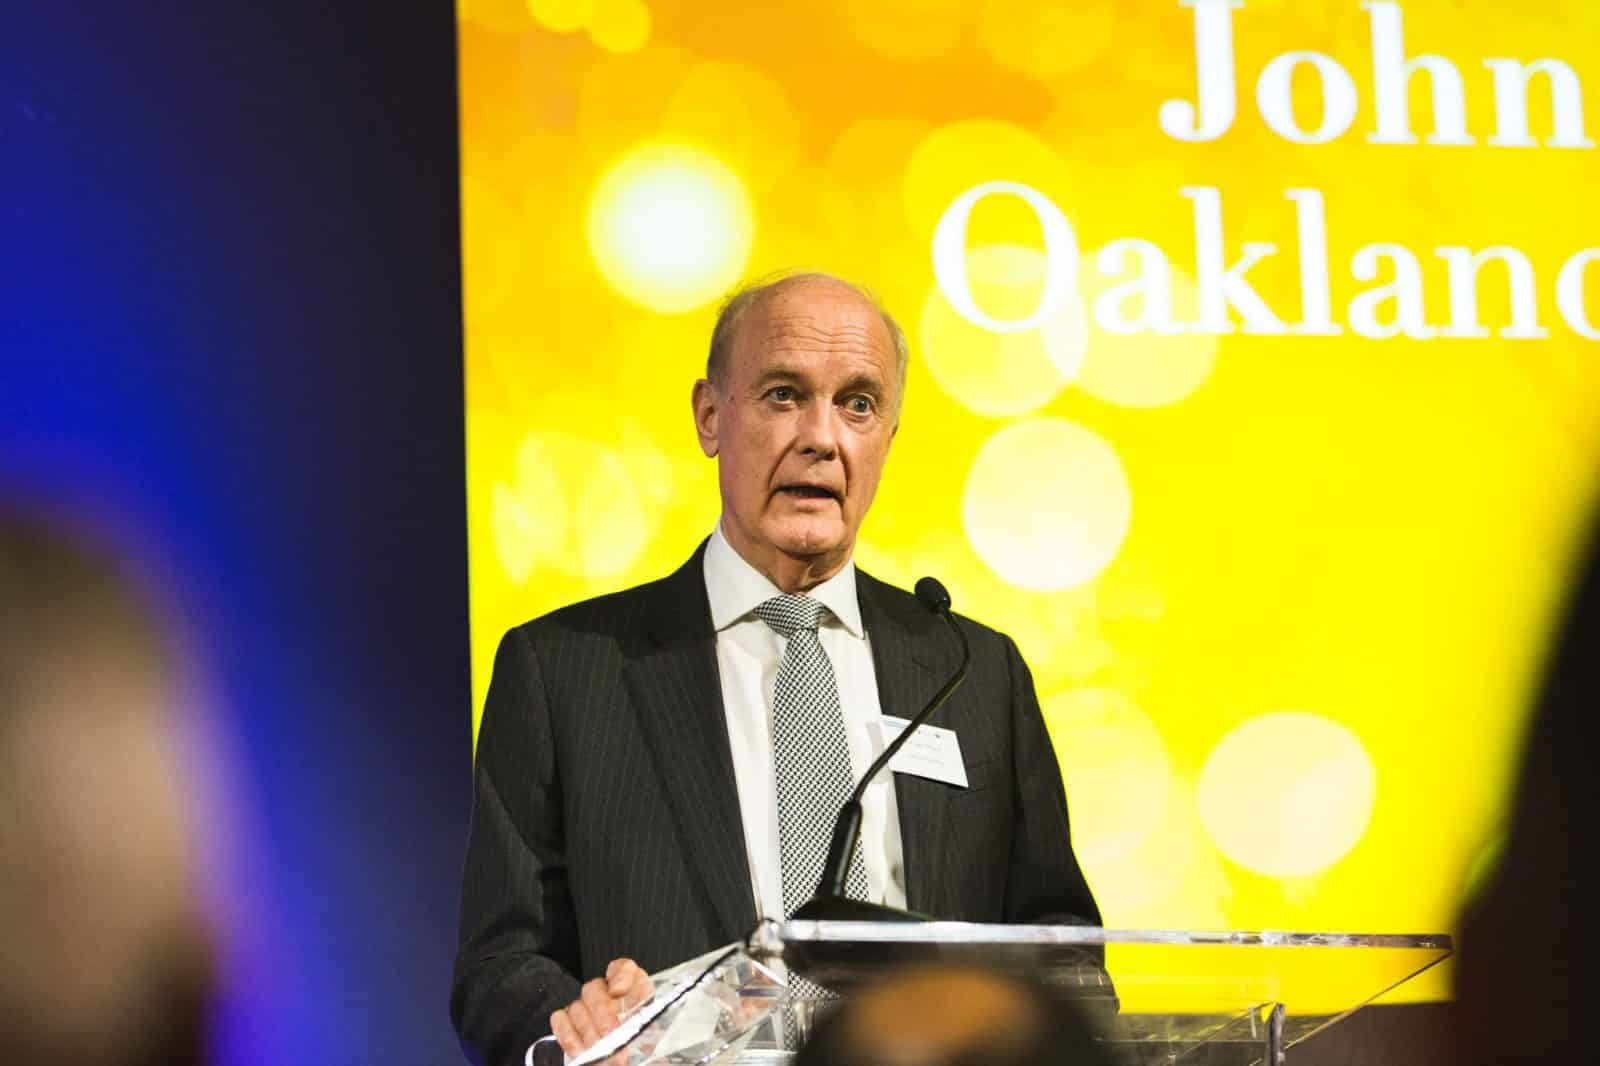 John Oakland receives award from CQI